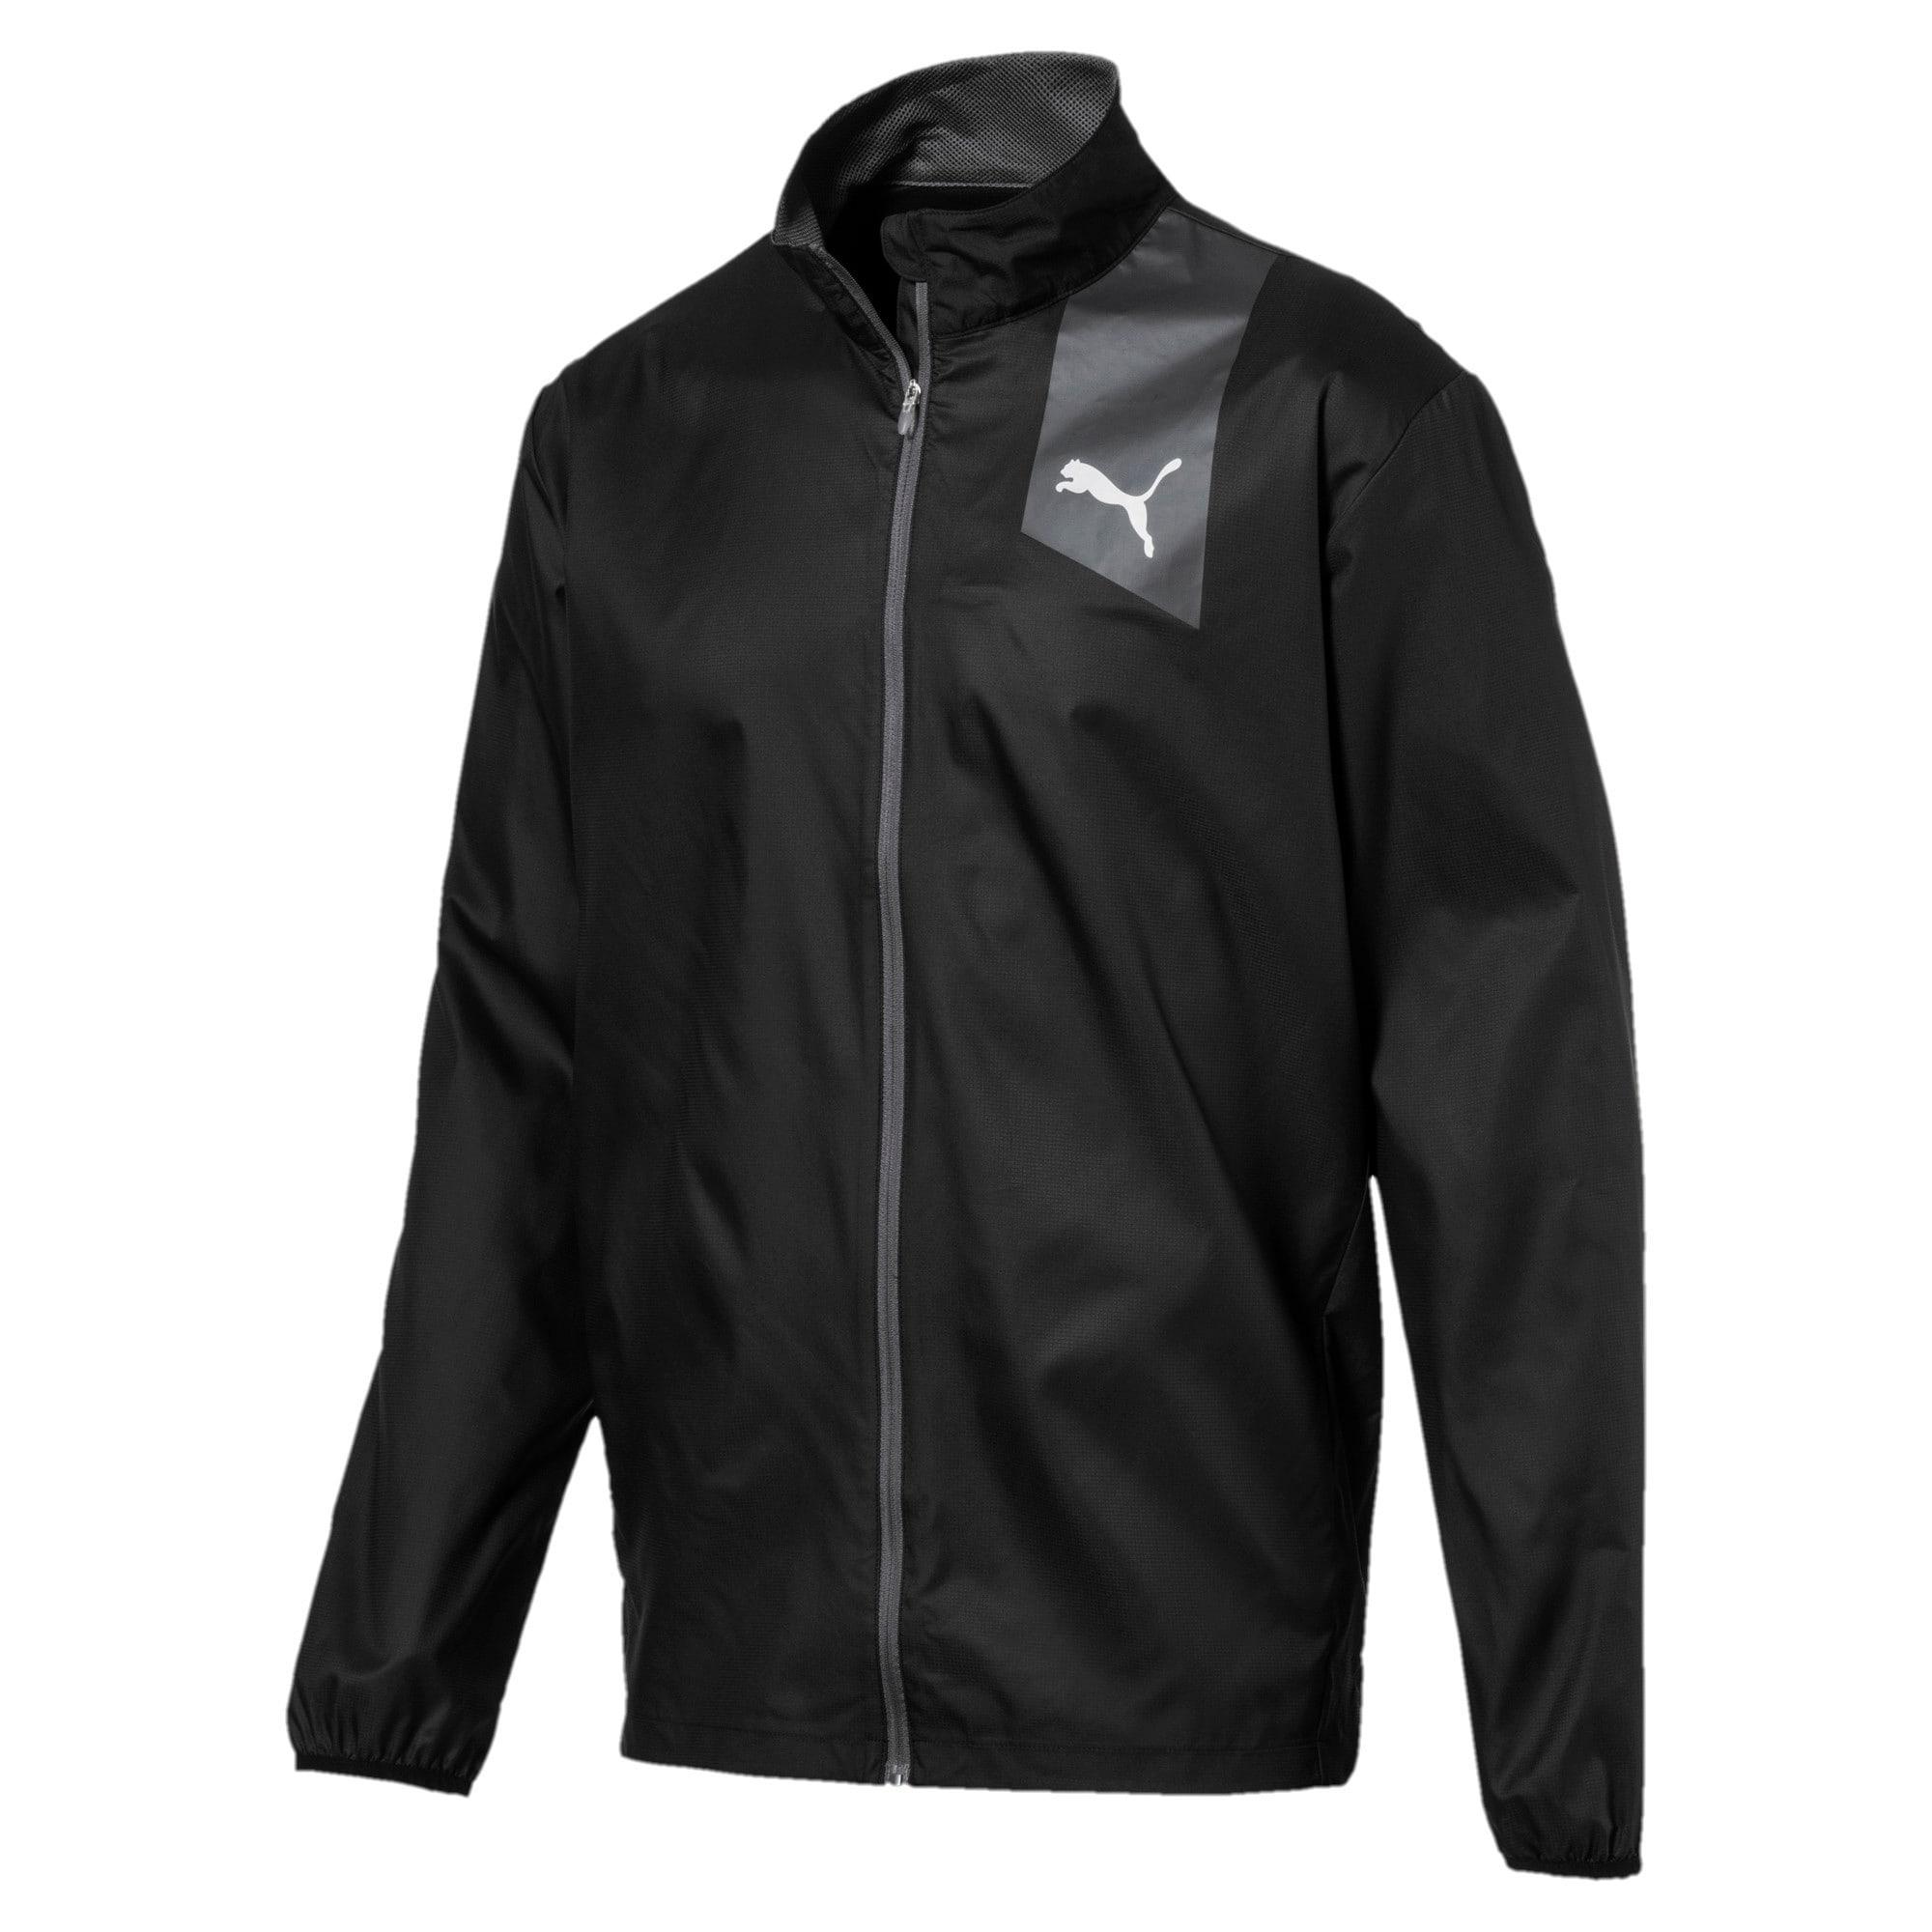 Thumbnail 4 of Running Men's IGNITE Jacket, Puma Black--black, medium-IND